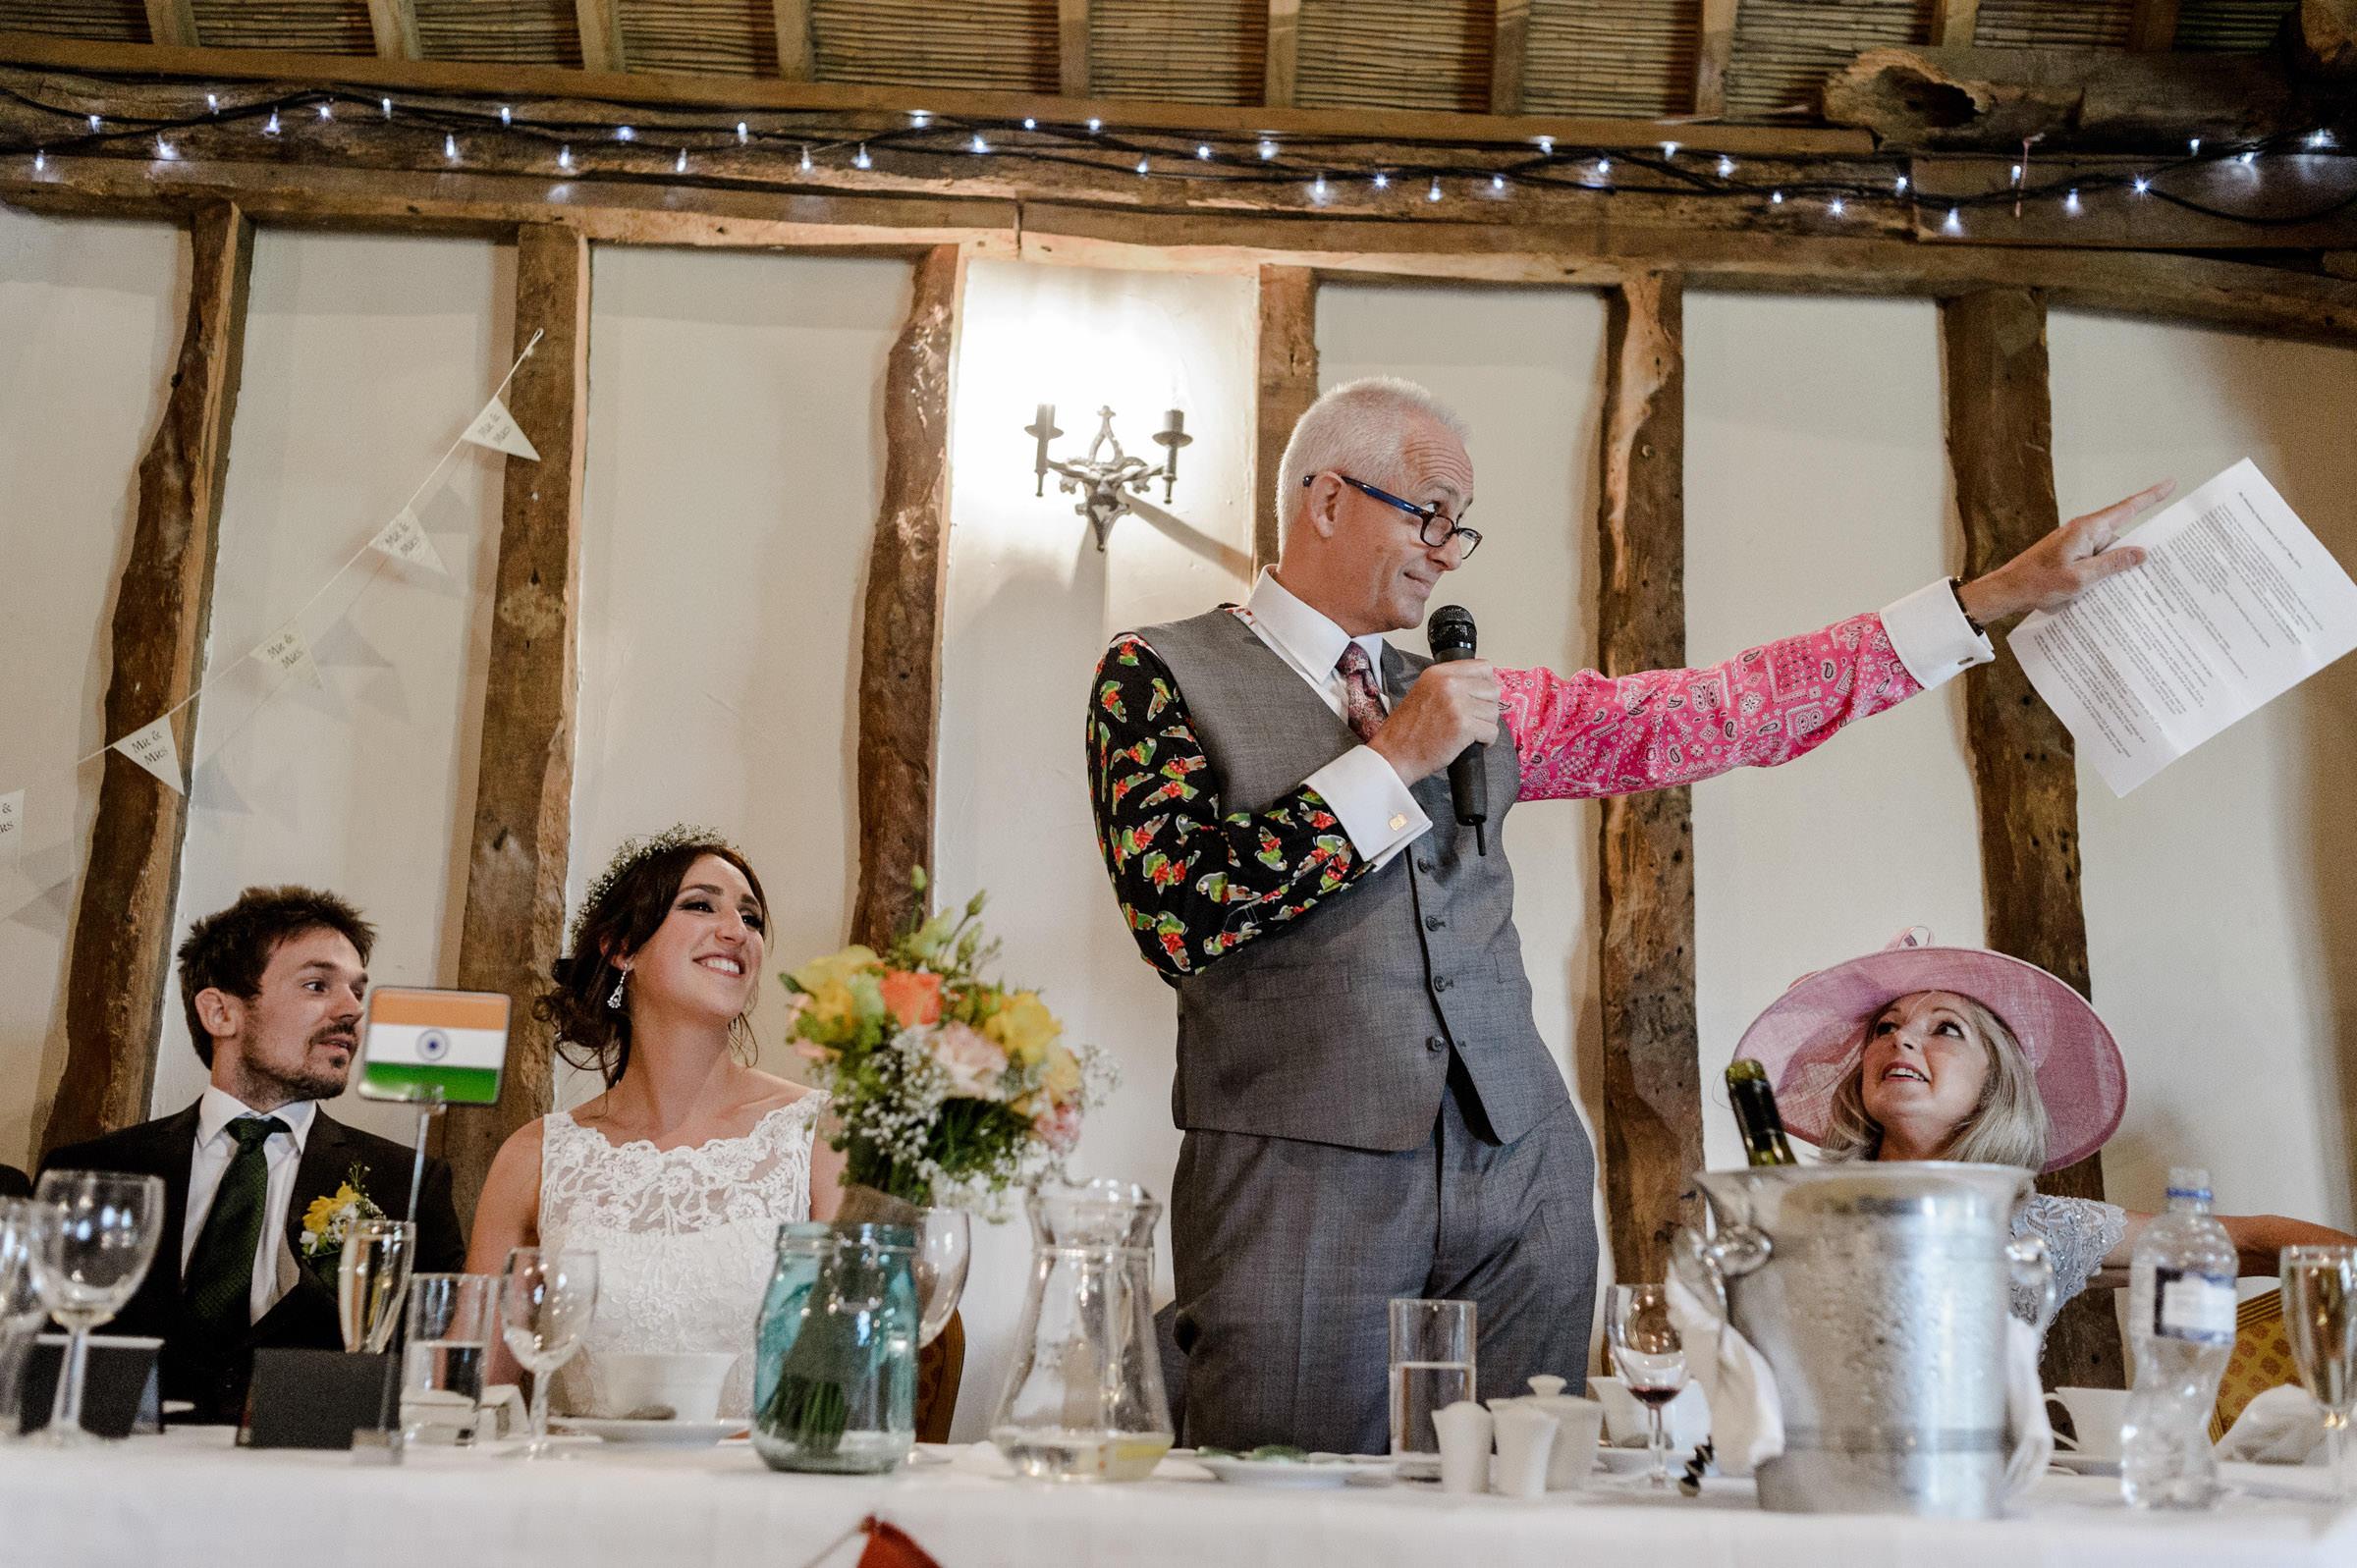 Notley Tythe Barn Reportage Wedding Photos 027.jpg